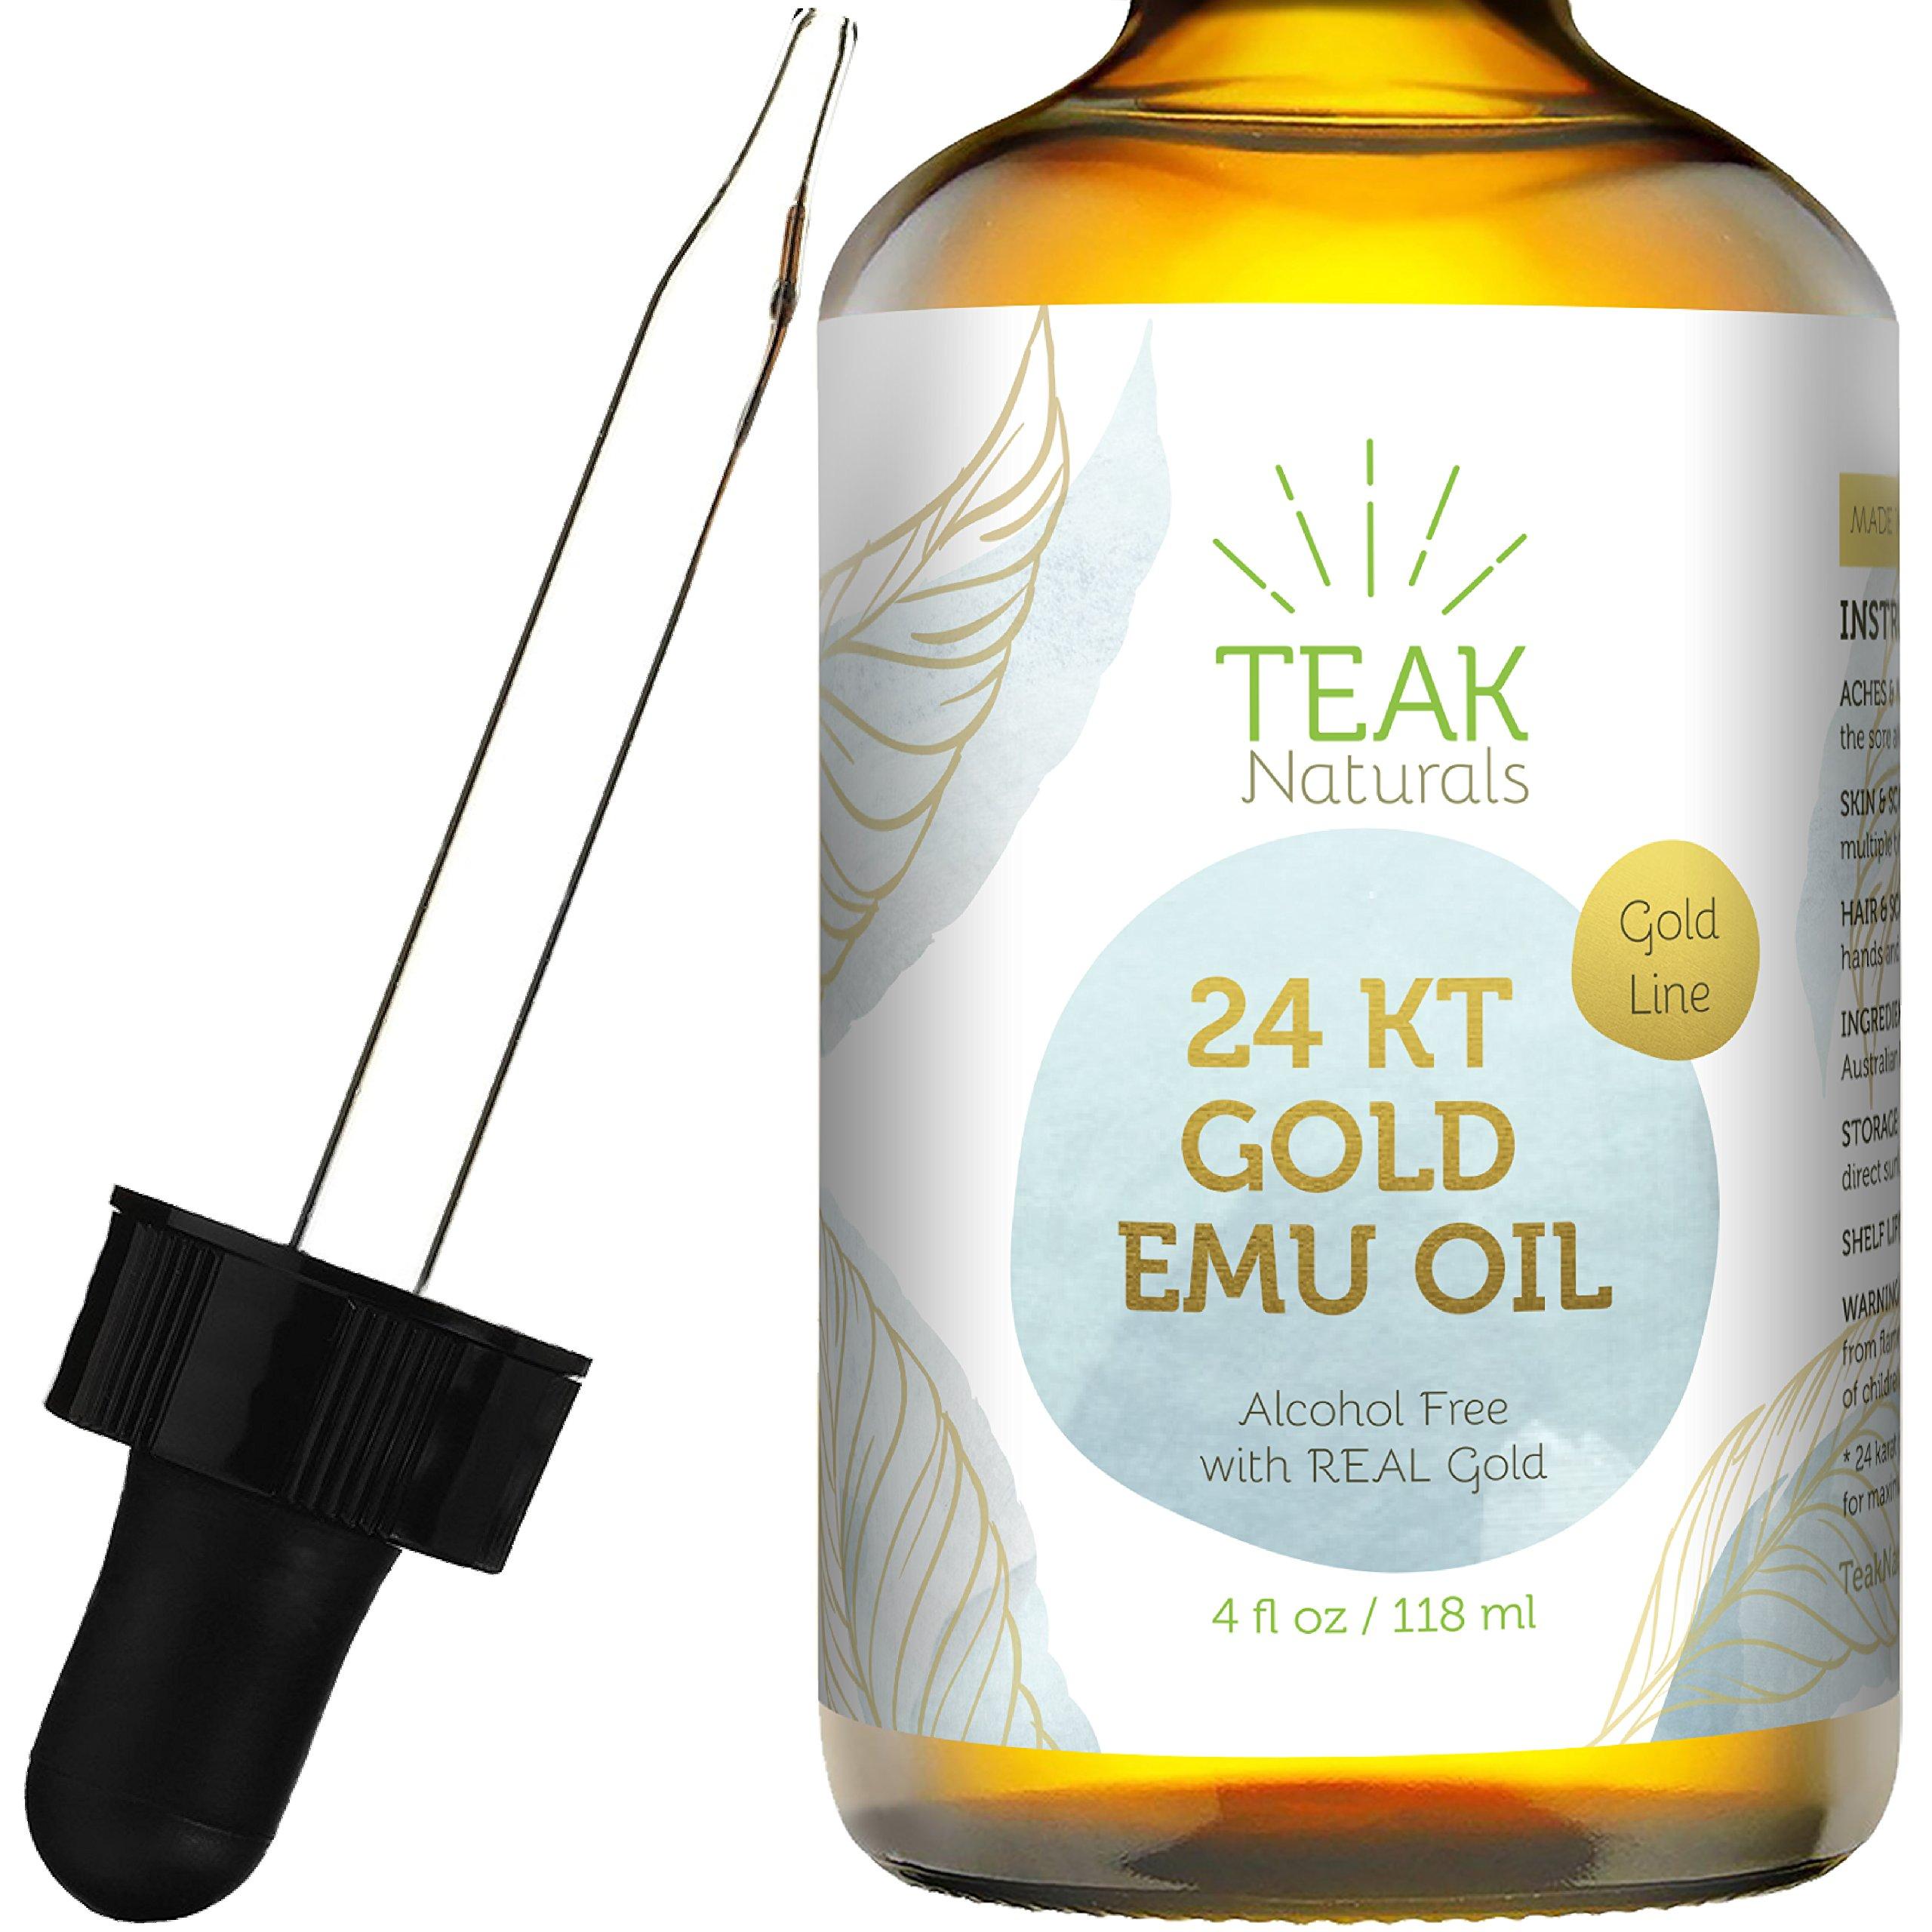 24K GOLD Emu Oil by Teak Naturals, 24 K Gold Organic Australian Emu Oil 4 oz Gold Line Series by Teak Naturals